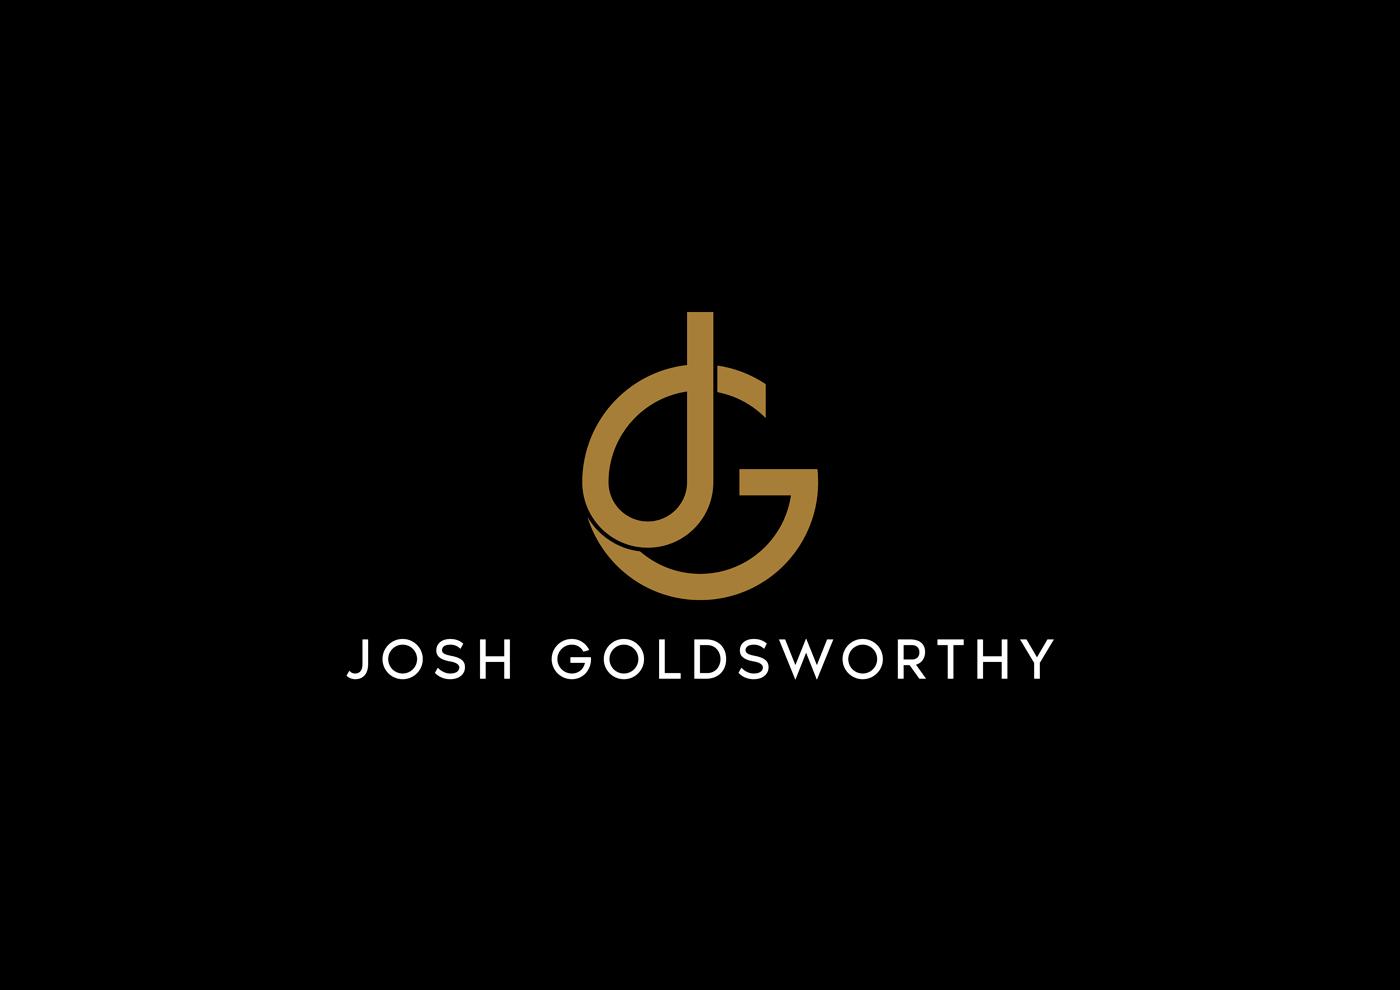 Josh Goldsworthy - Final Logo